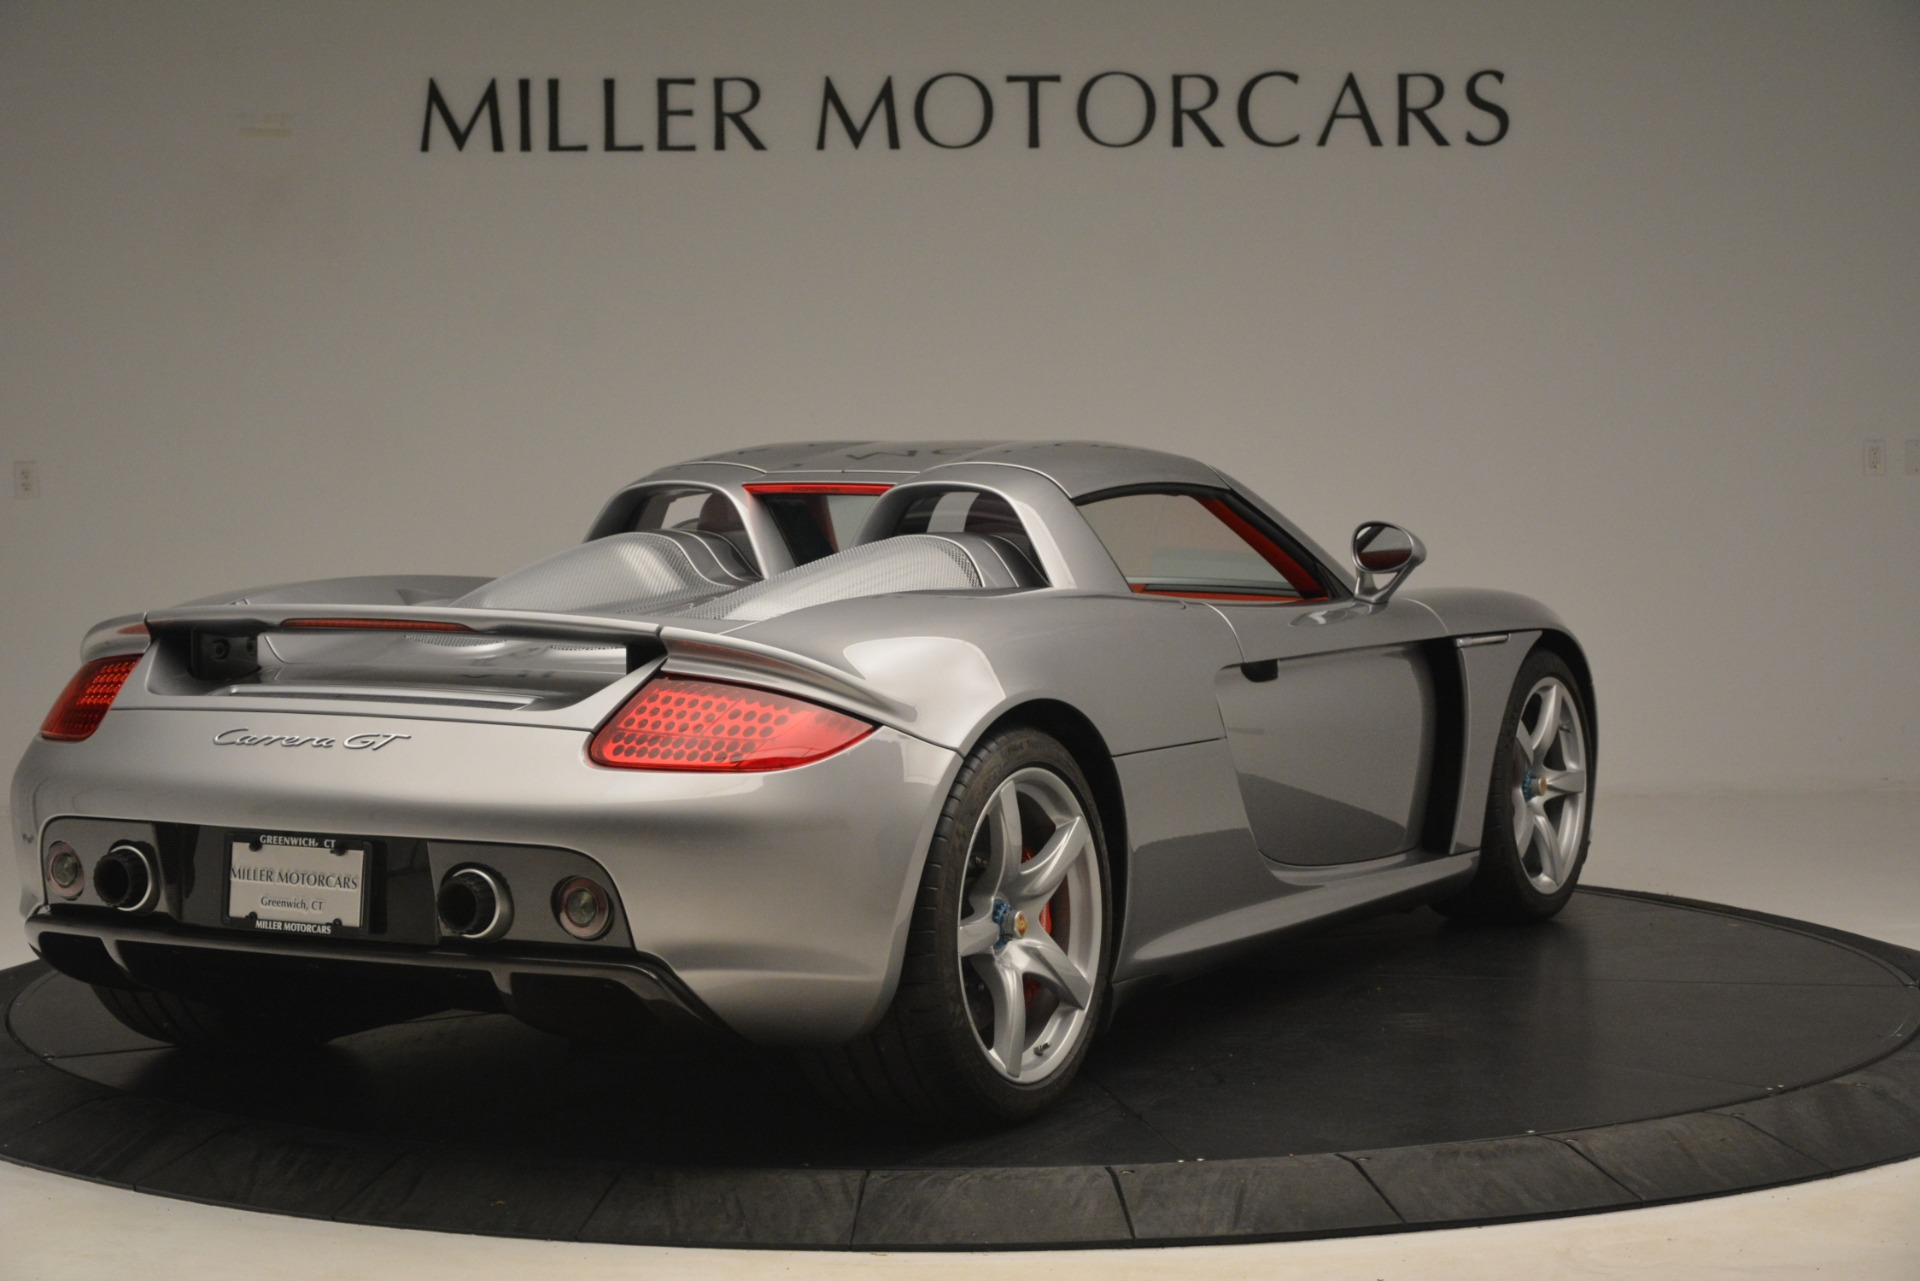 Used 2005 Porsche Carrera GT  For Sale In Greenwich, CT 3161_p18